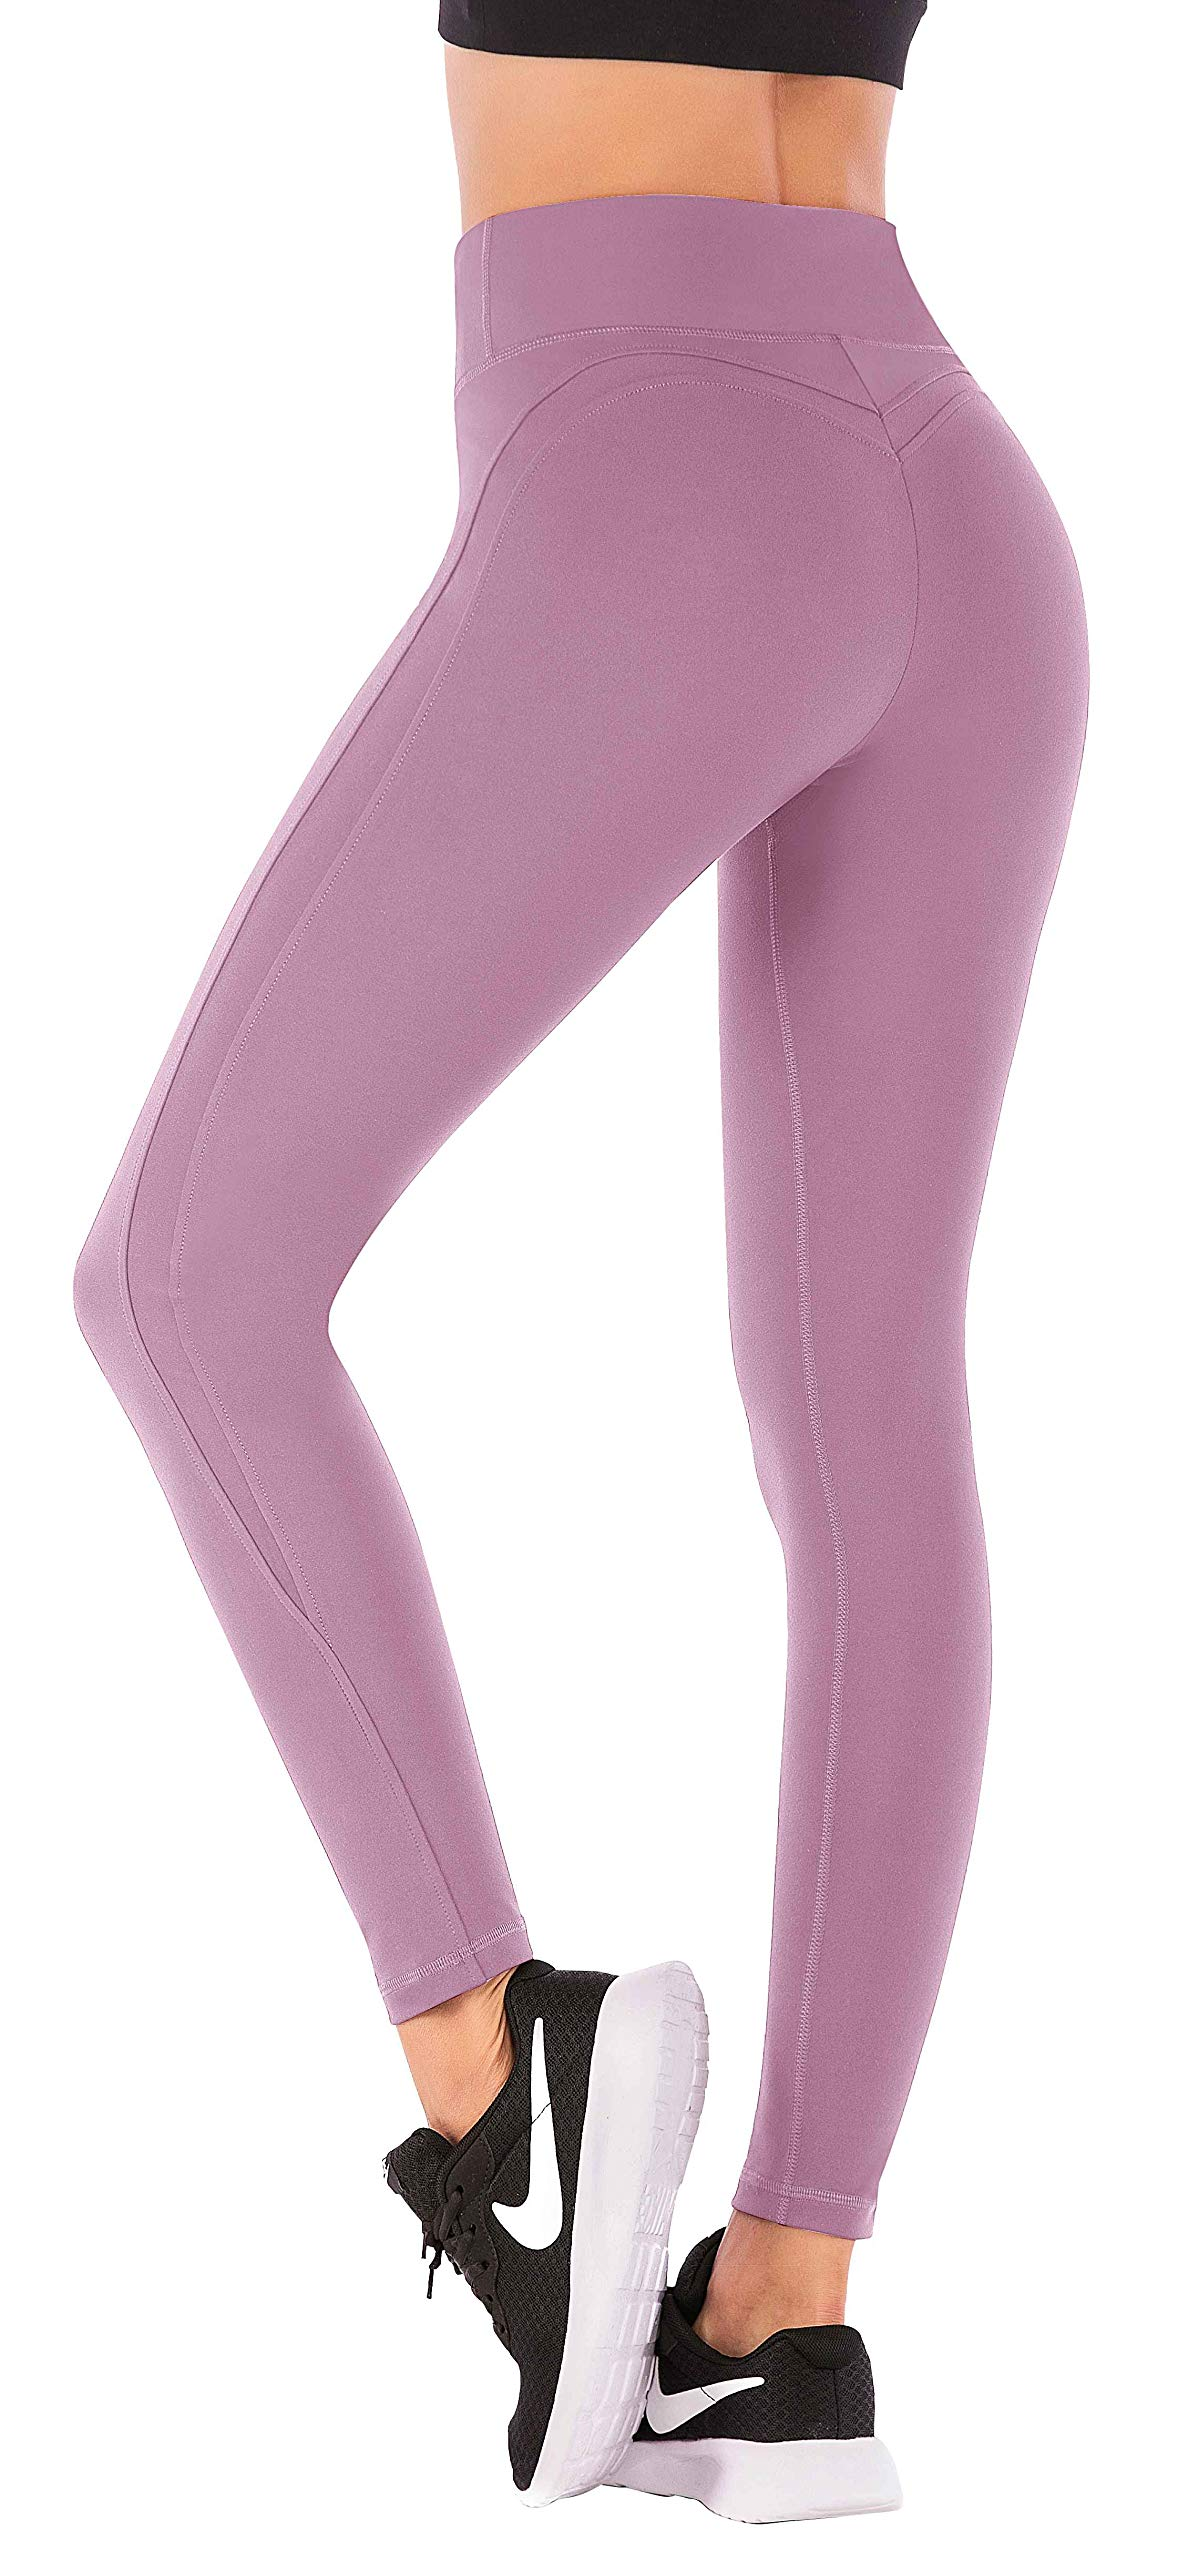 IUGA Yoga Pants with Pockets Workout Leggings for Women 4 Way Stretch Yoga Leggings with Pockets (Begonia Pink 7850, Small)